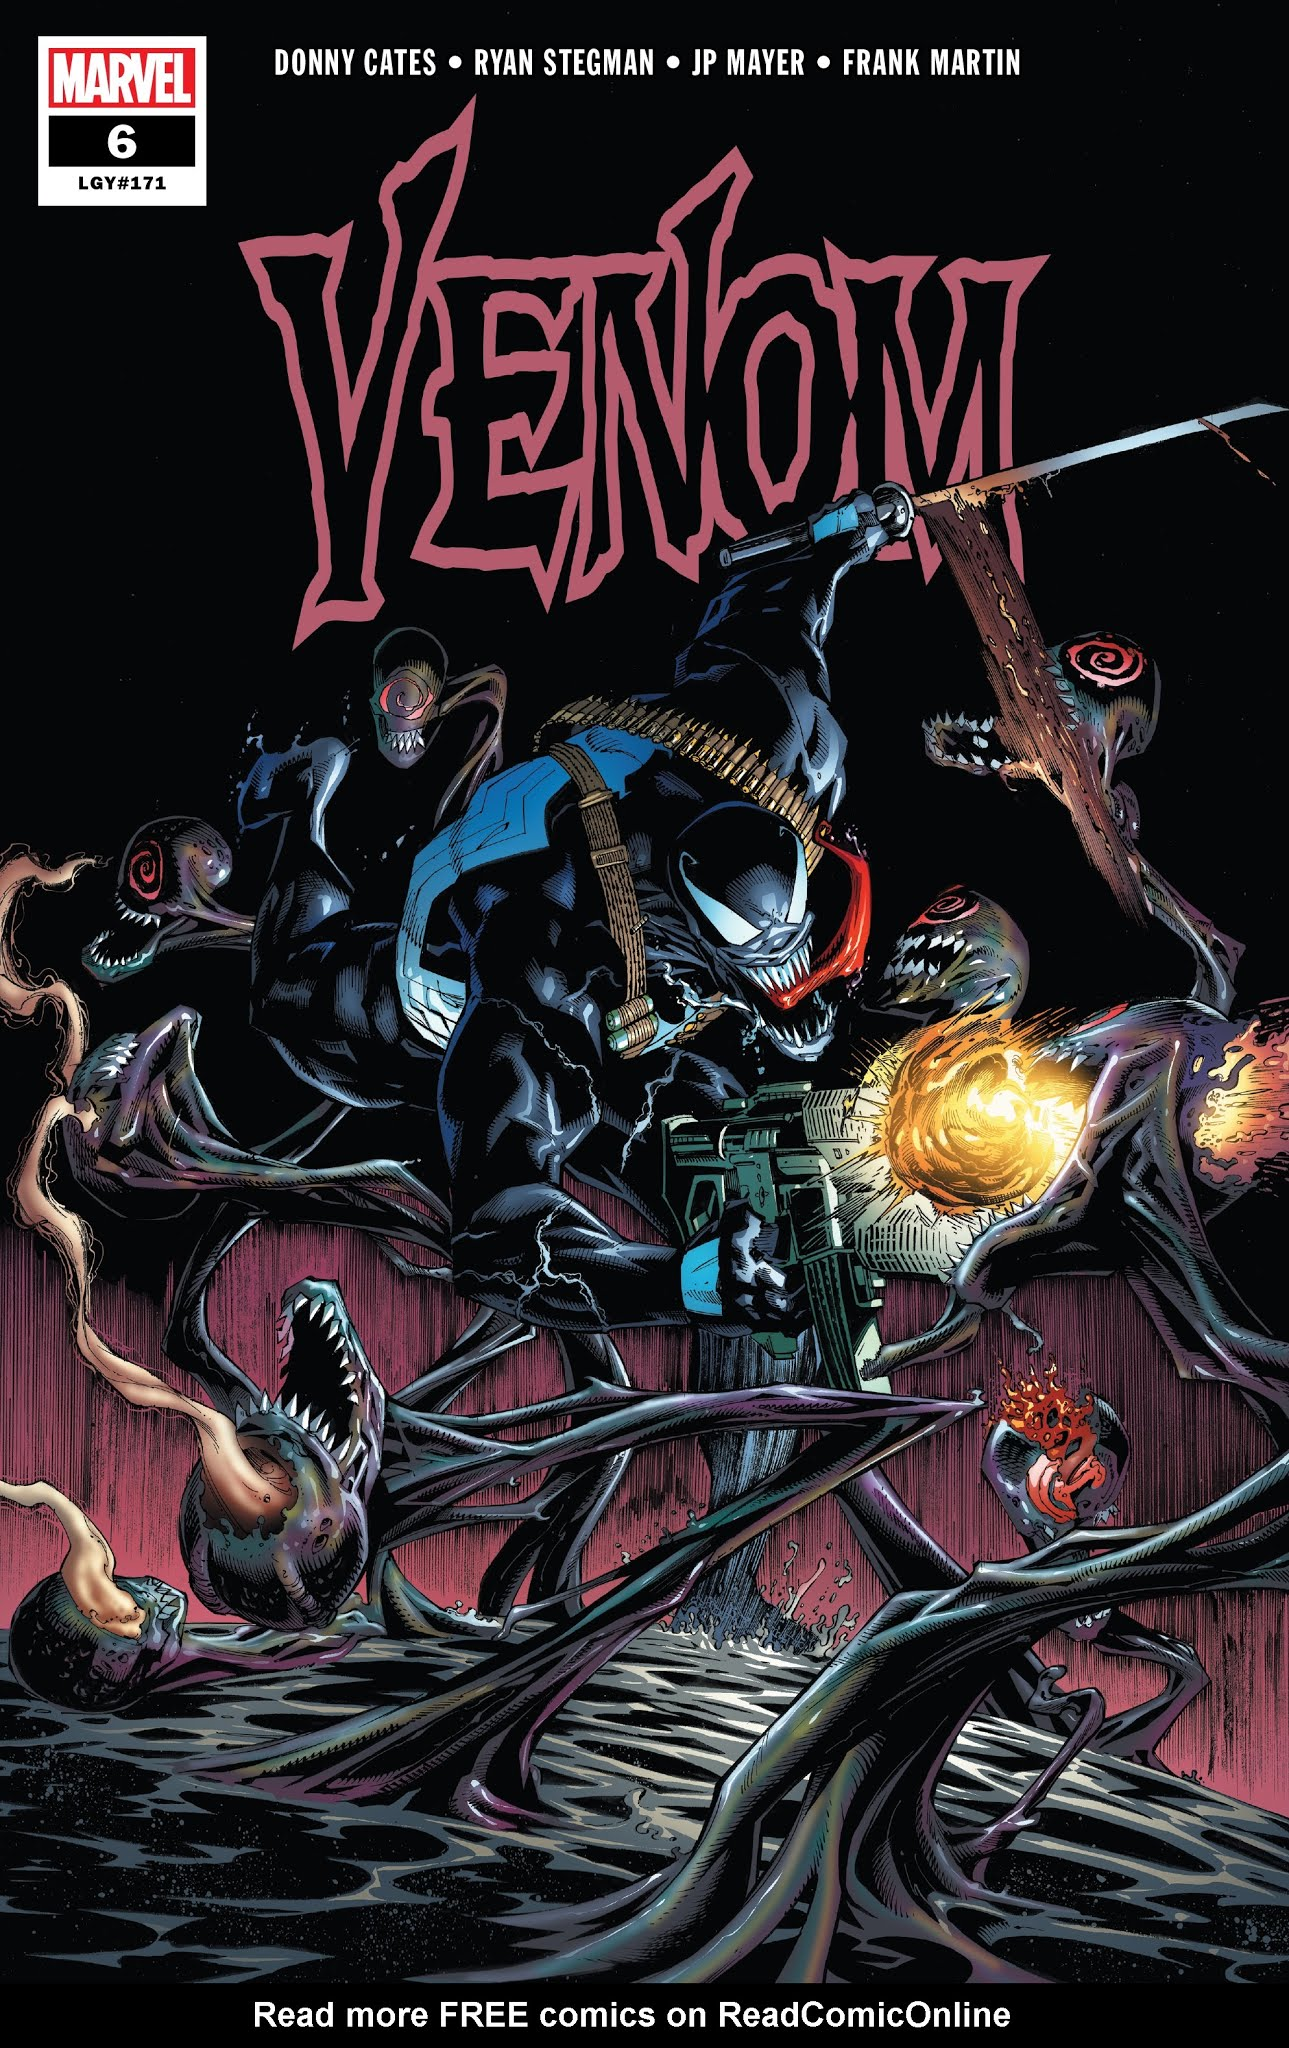 Venom (2018) 6 Page 1